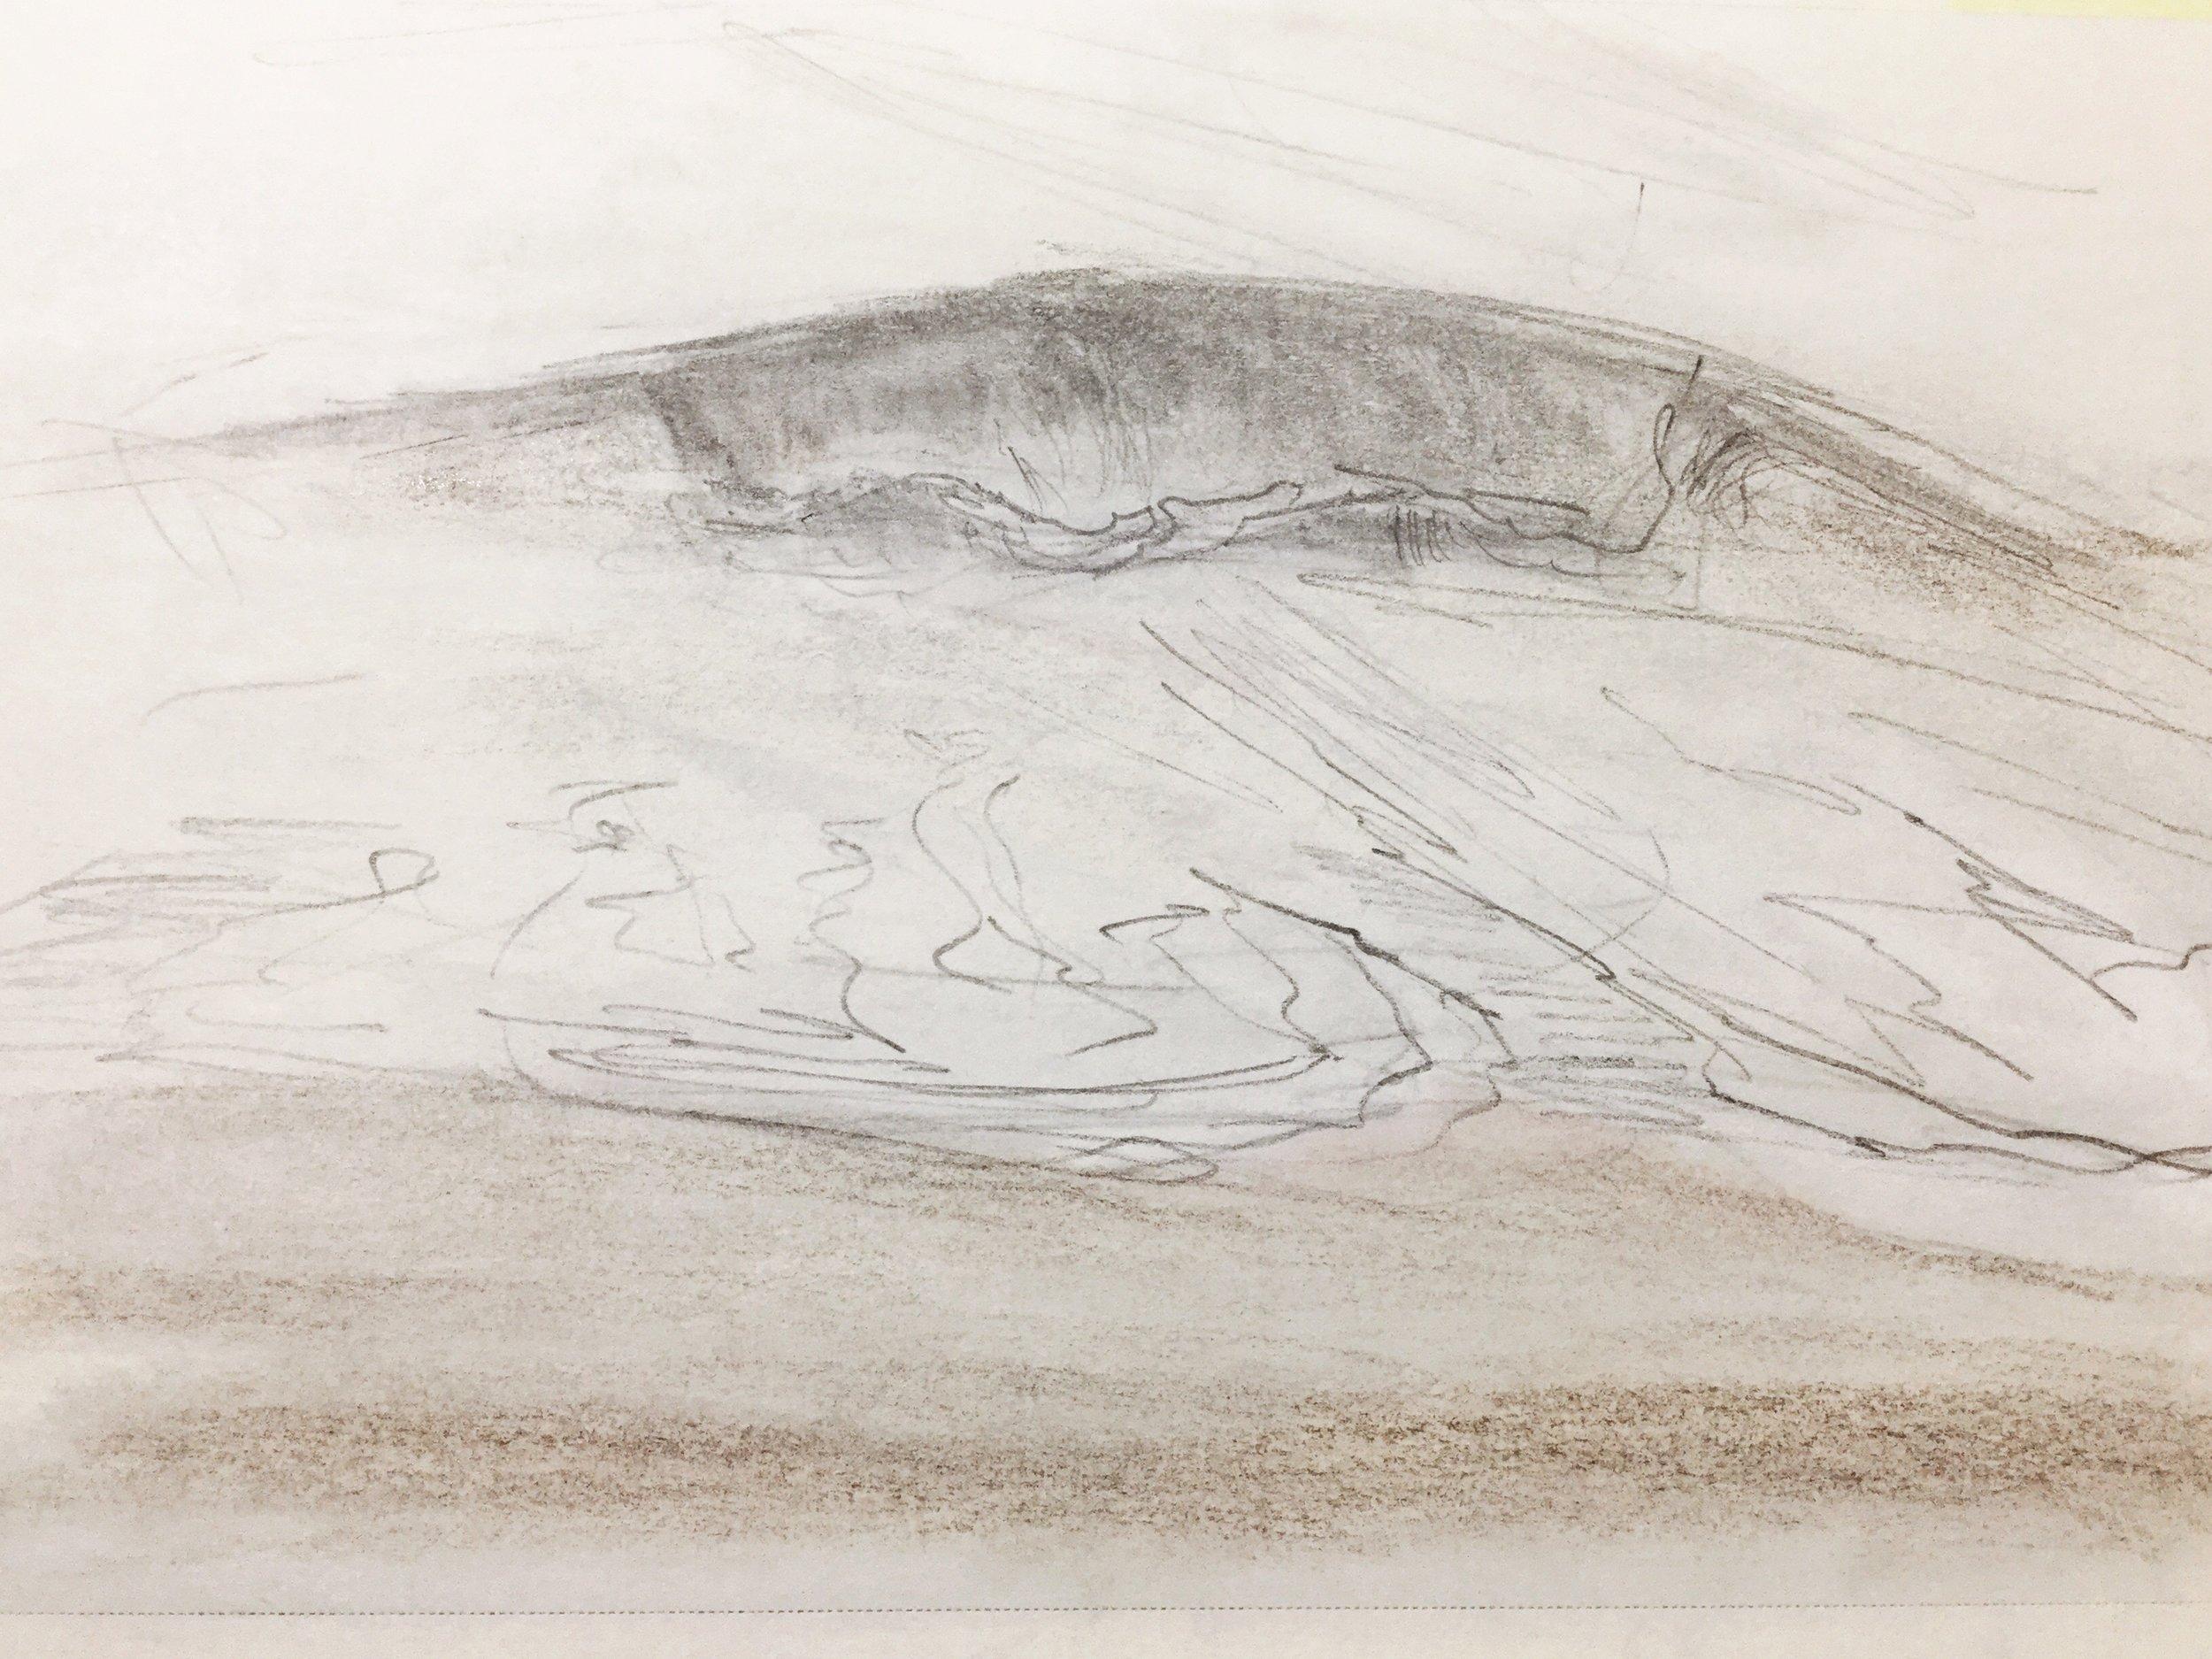 grace-lane-smith-art-wave-study.JPG